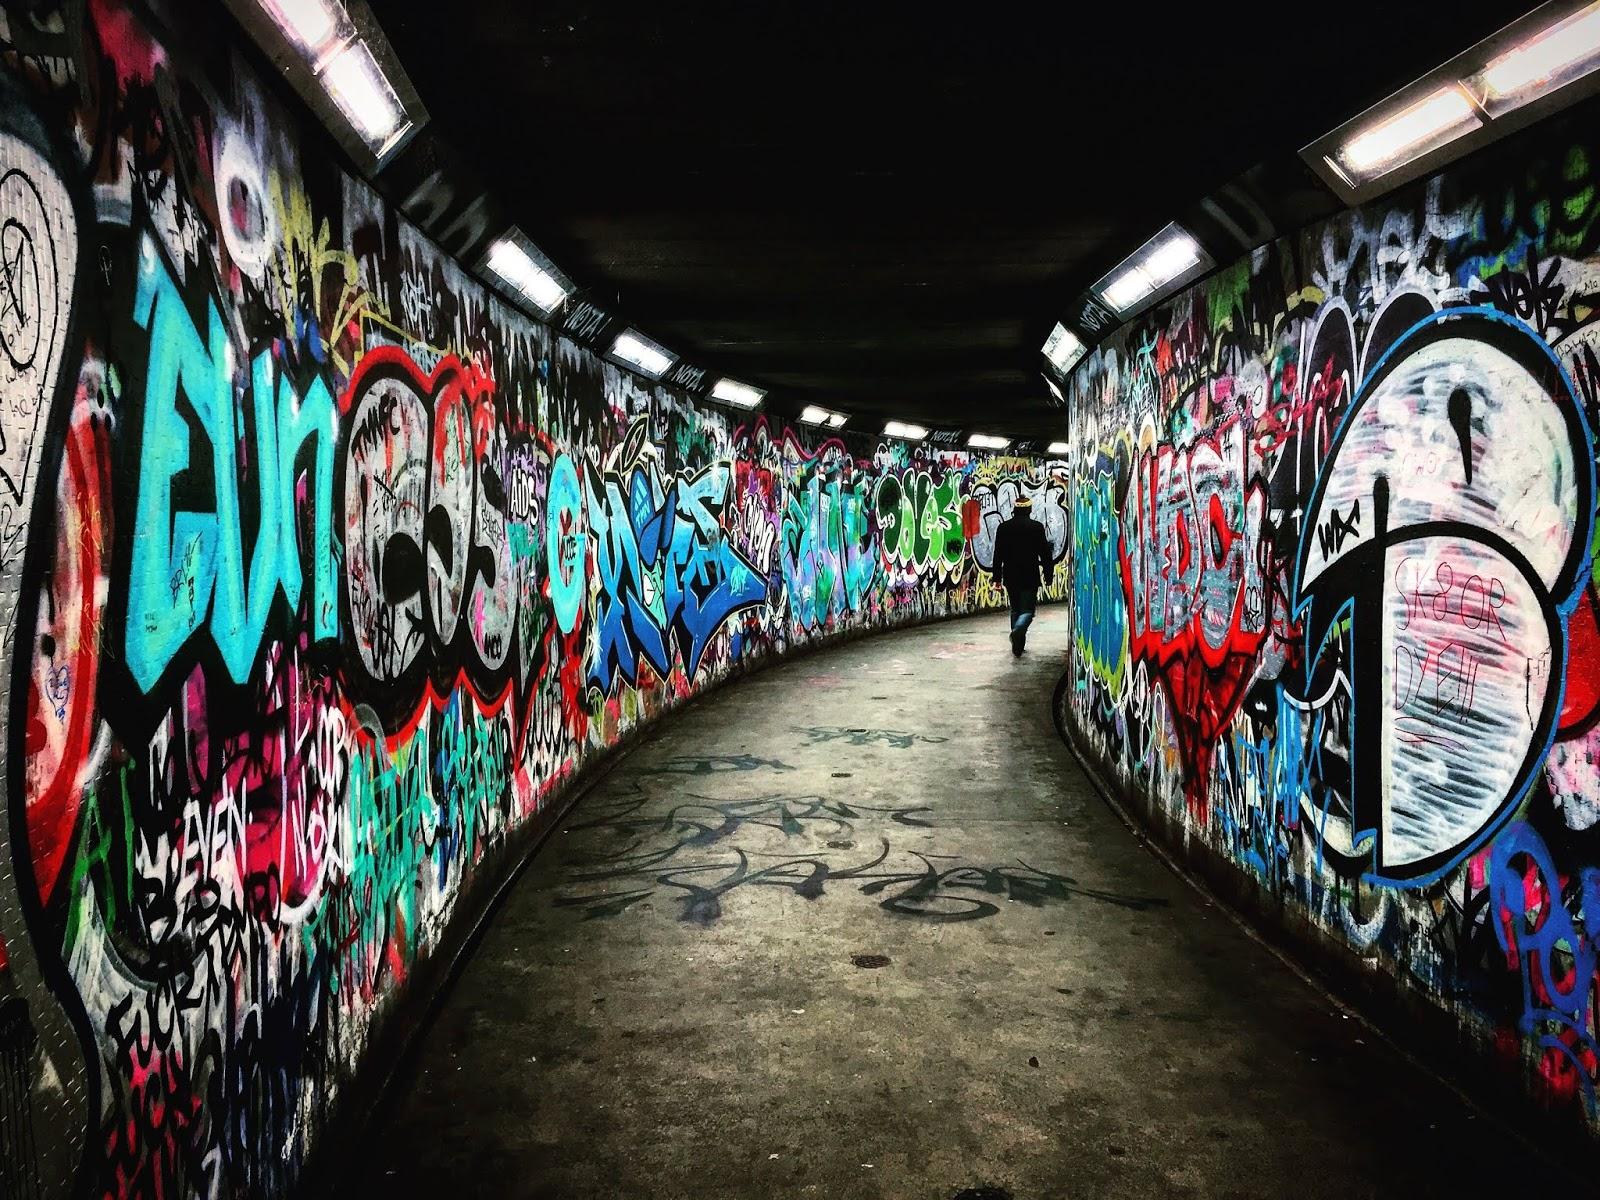 Man walking through subway corridor with graffiti on walls to illustrate blog post about gang warfare